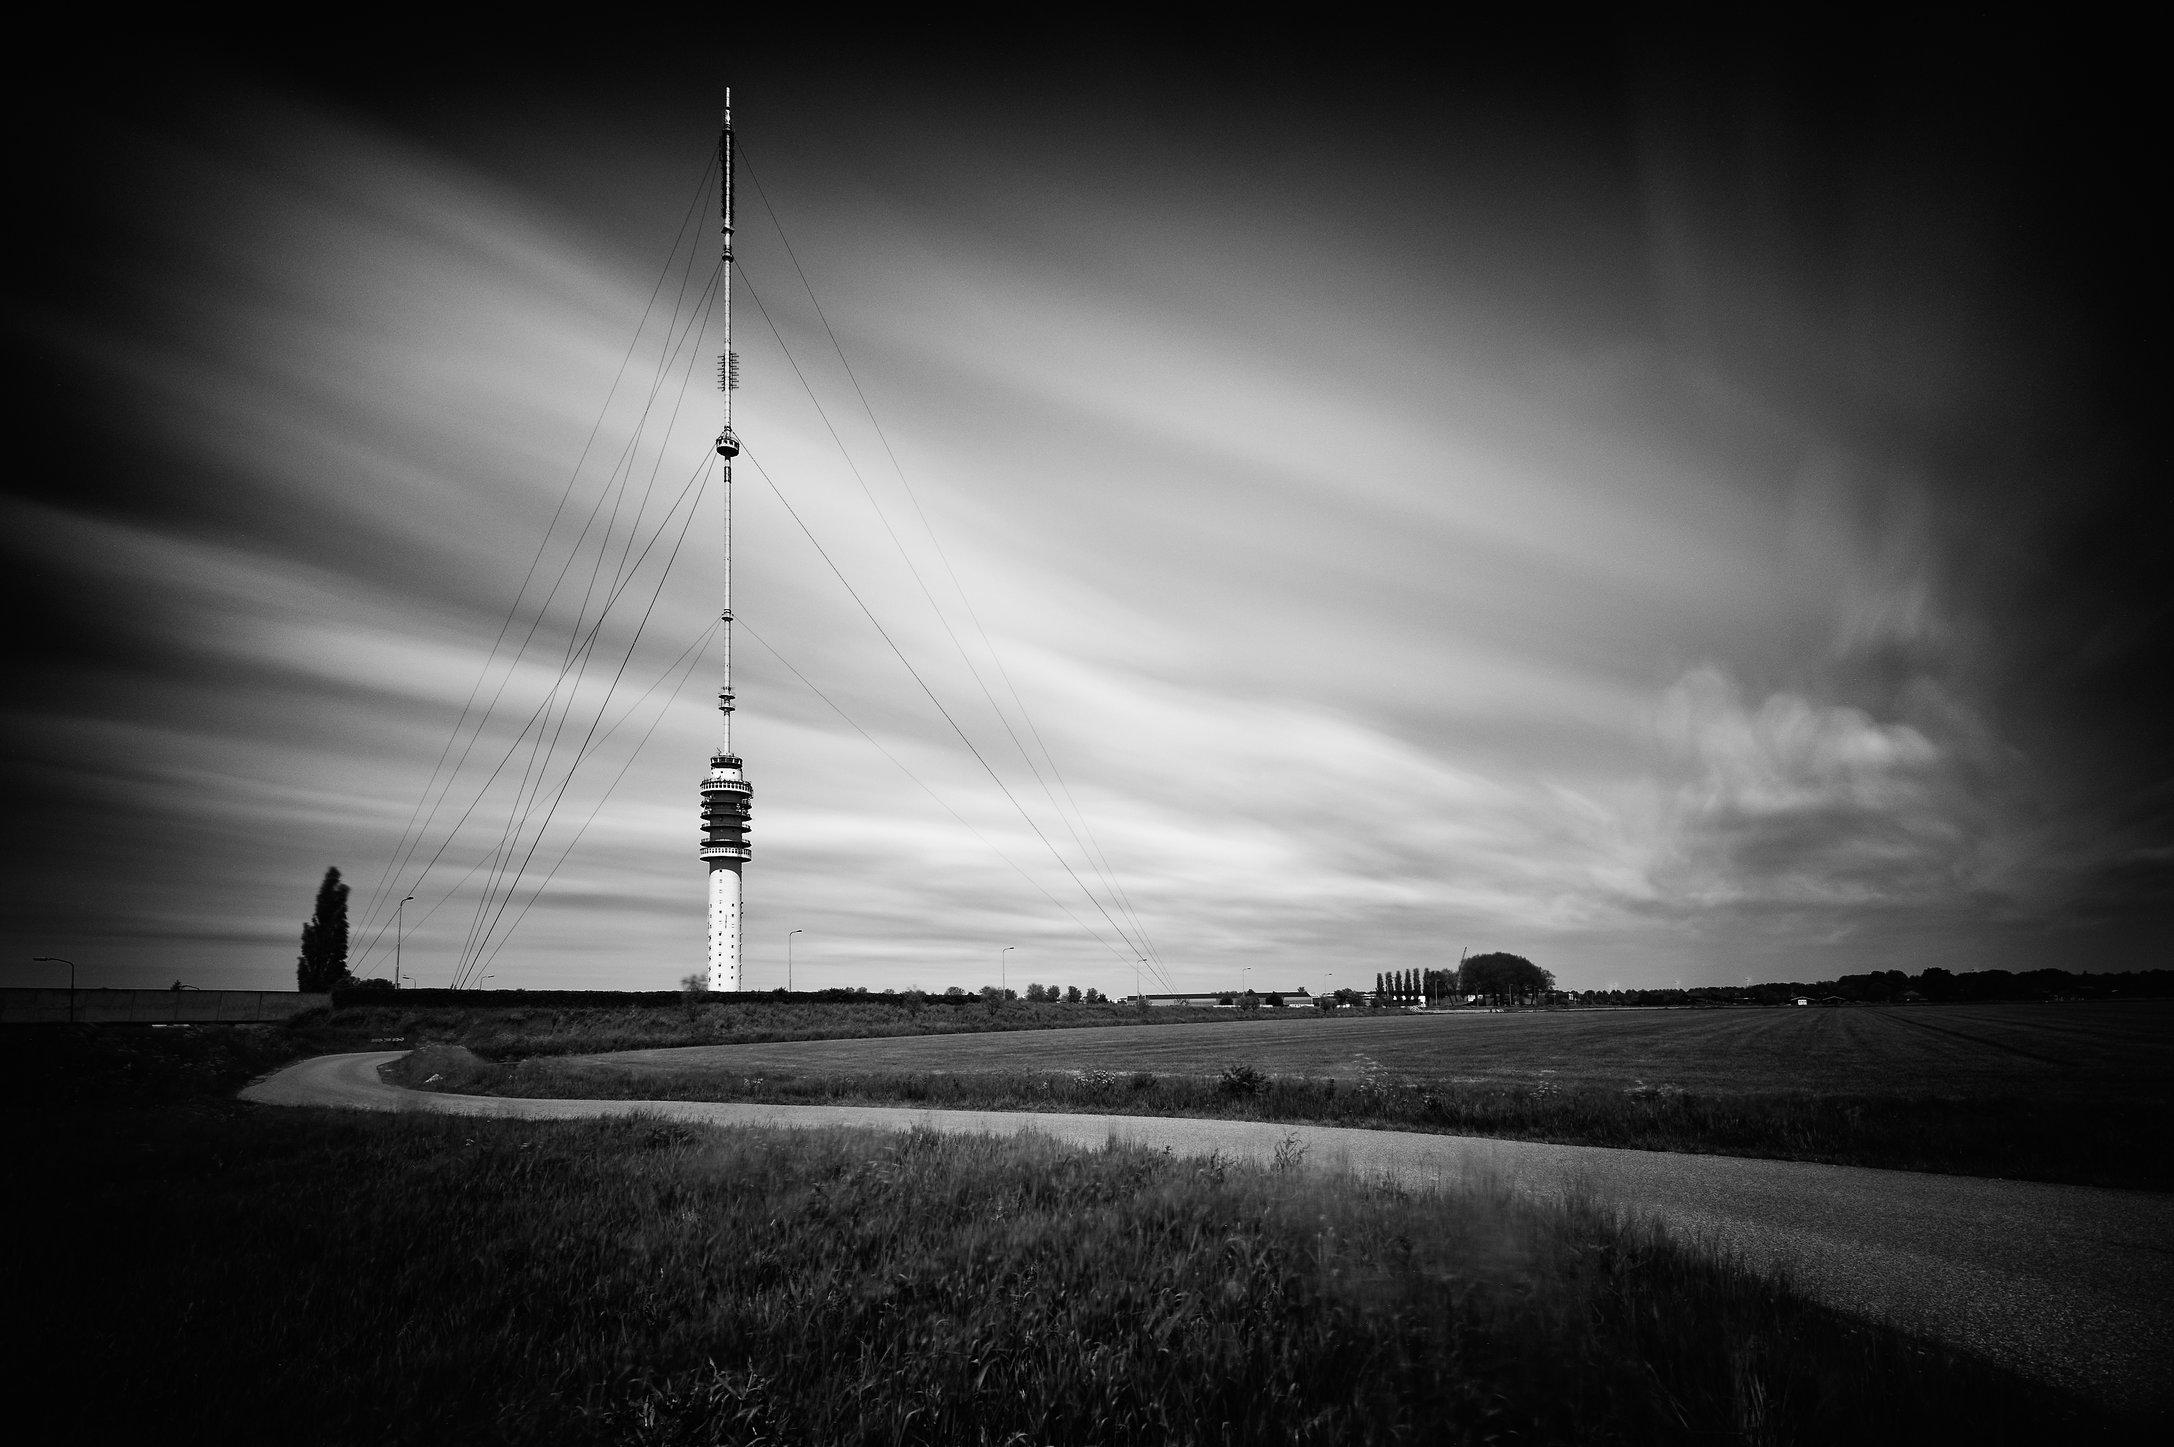 Gerbrandy toren, IJsselstein